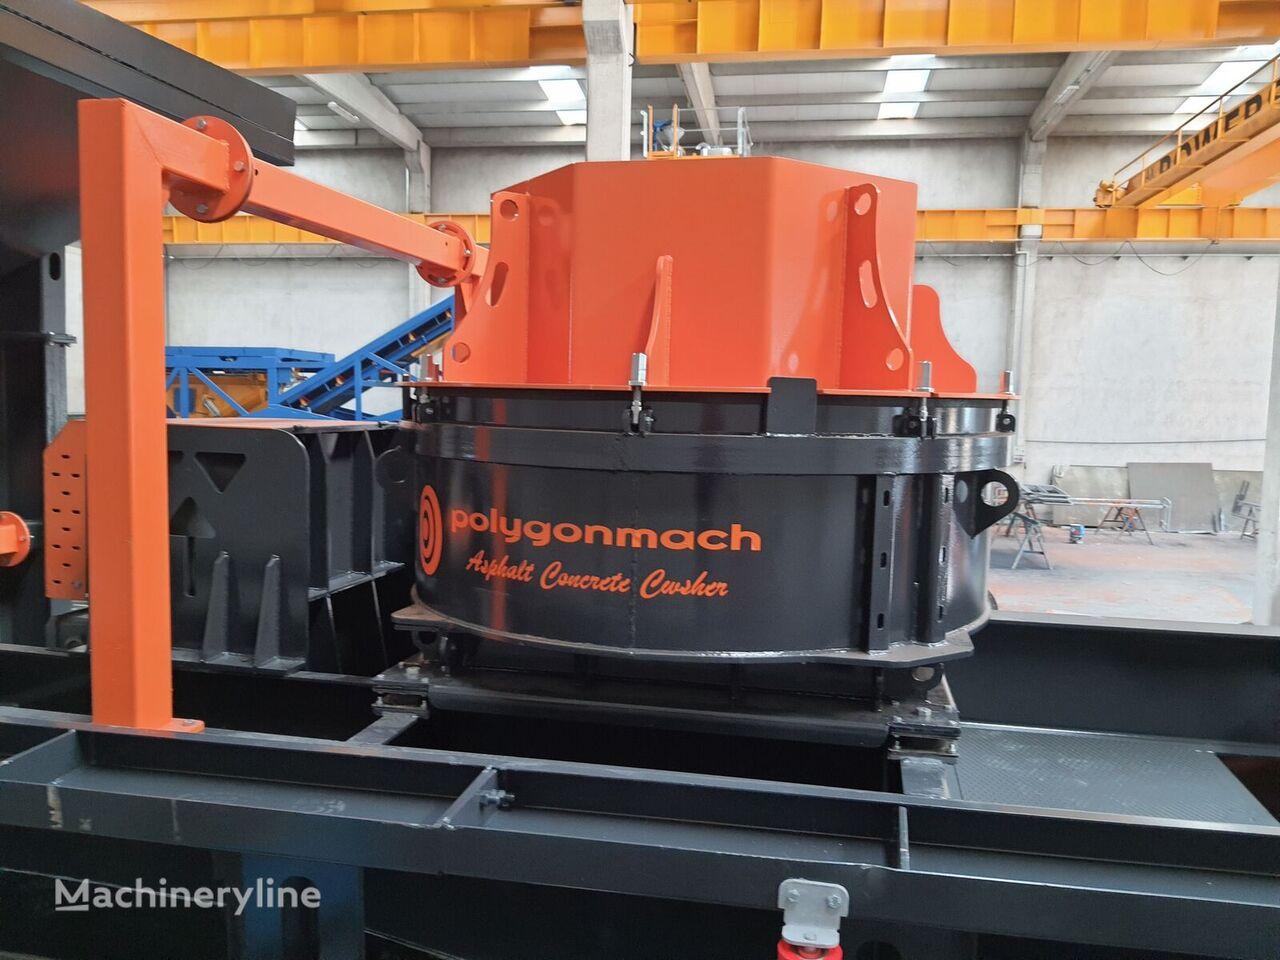 new POLYGONMACH VSI700/800/900 VERTICAL SHAFT IMPACTOR stone crusher